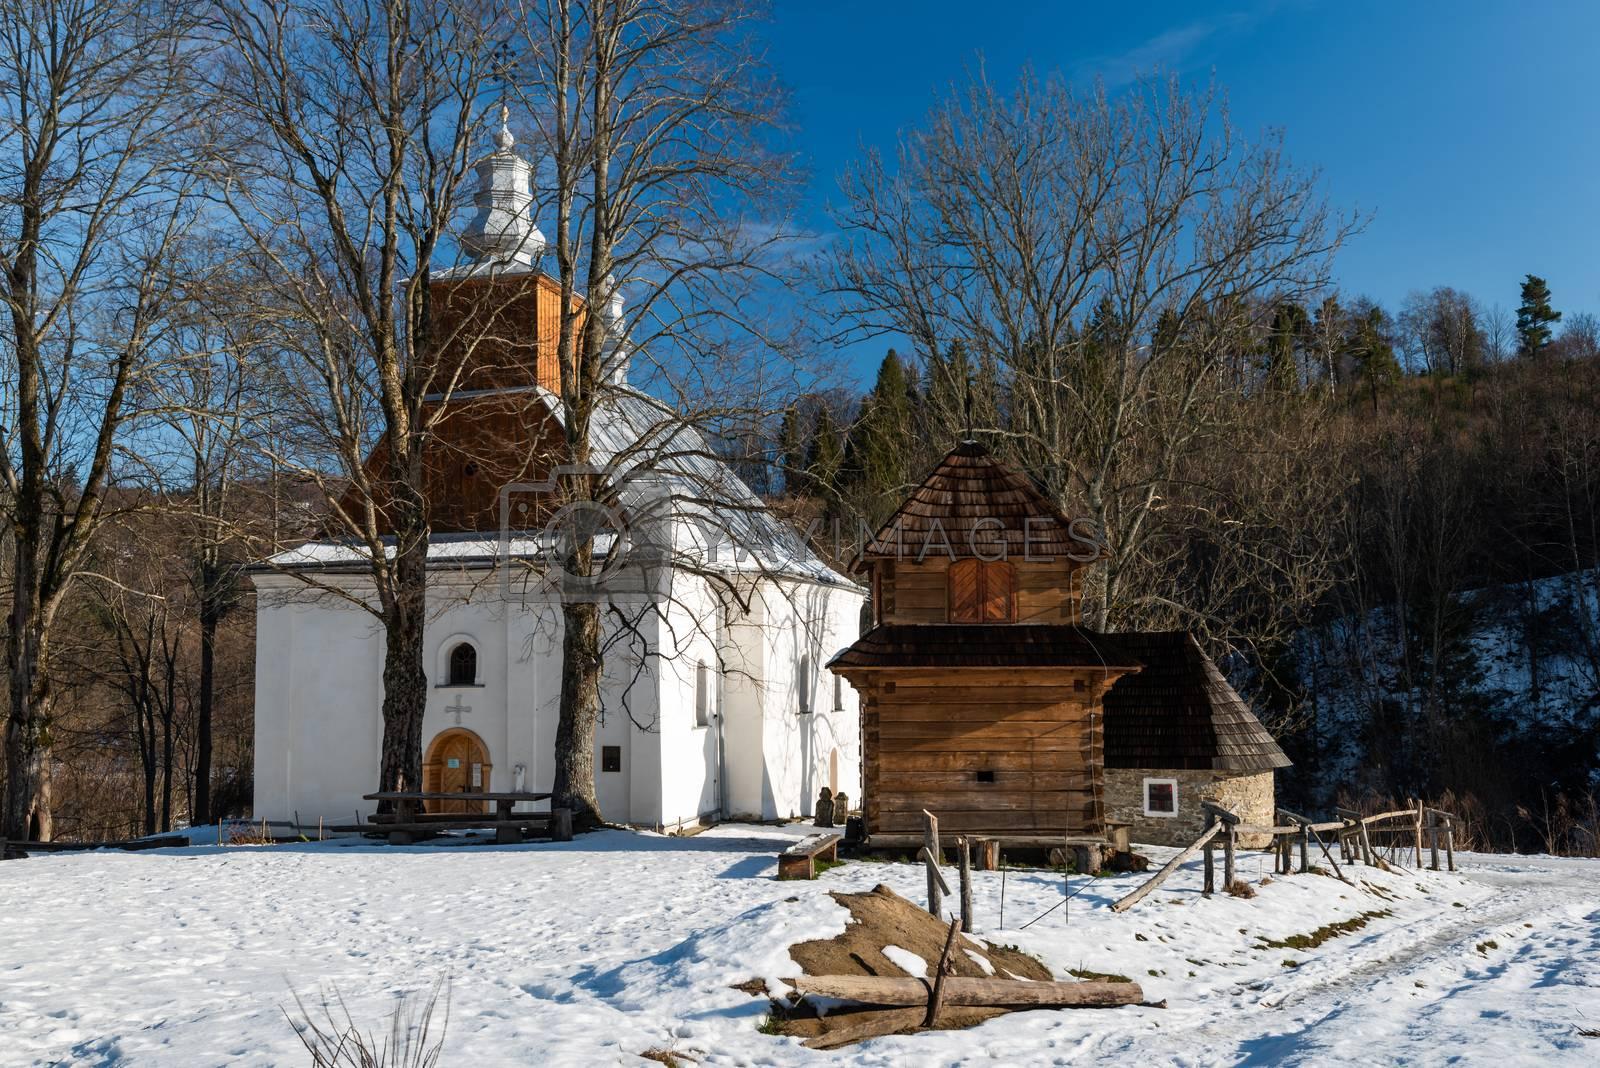 Orthodox Church in Lopienka. Carpathian Mountains and Bieszczady Architecture in Winter.